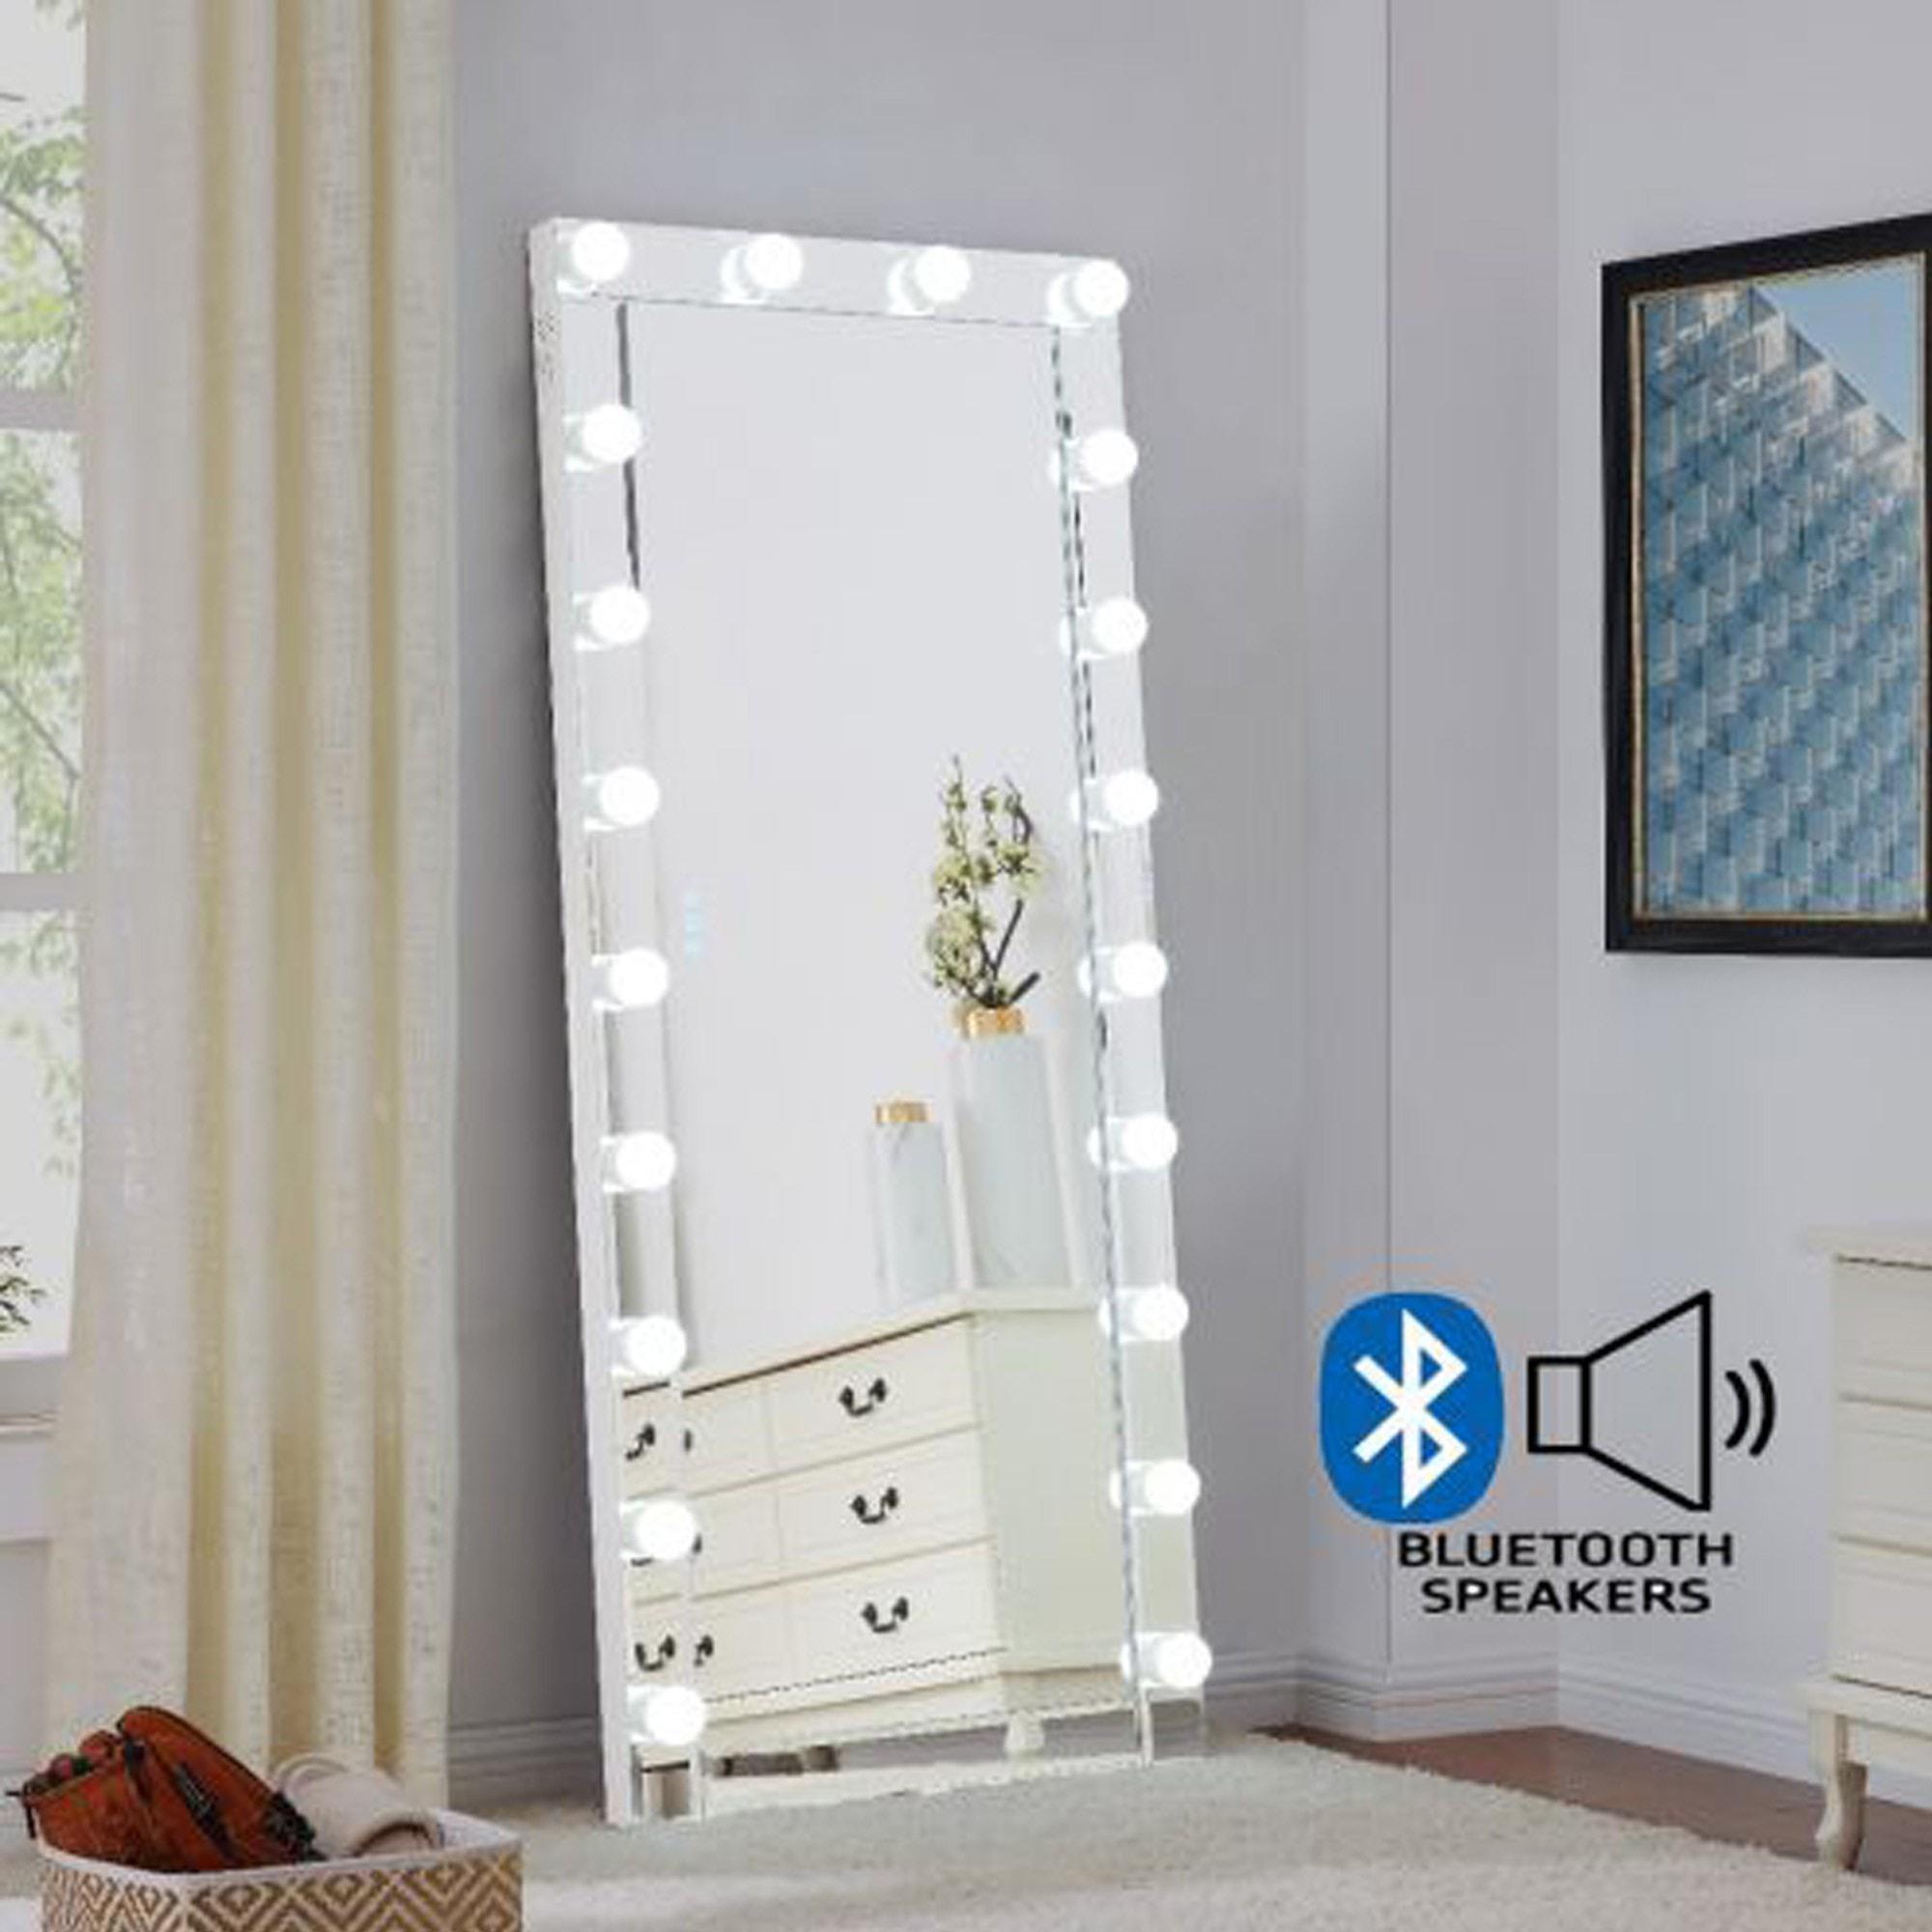 Hollywood Glass Floor Mirror With Bluetooth Speaker Floorstanding Mirrors